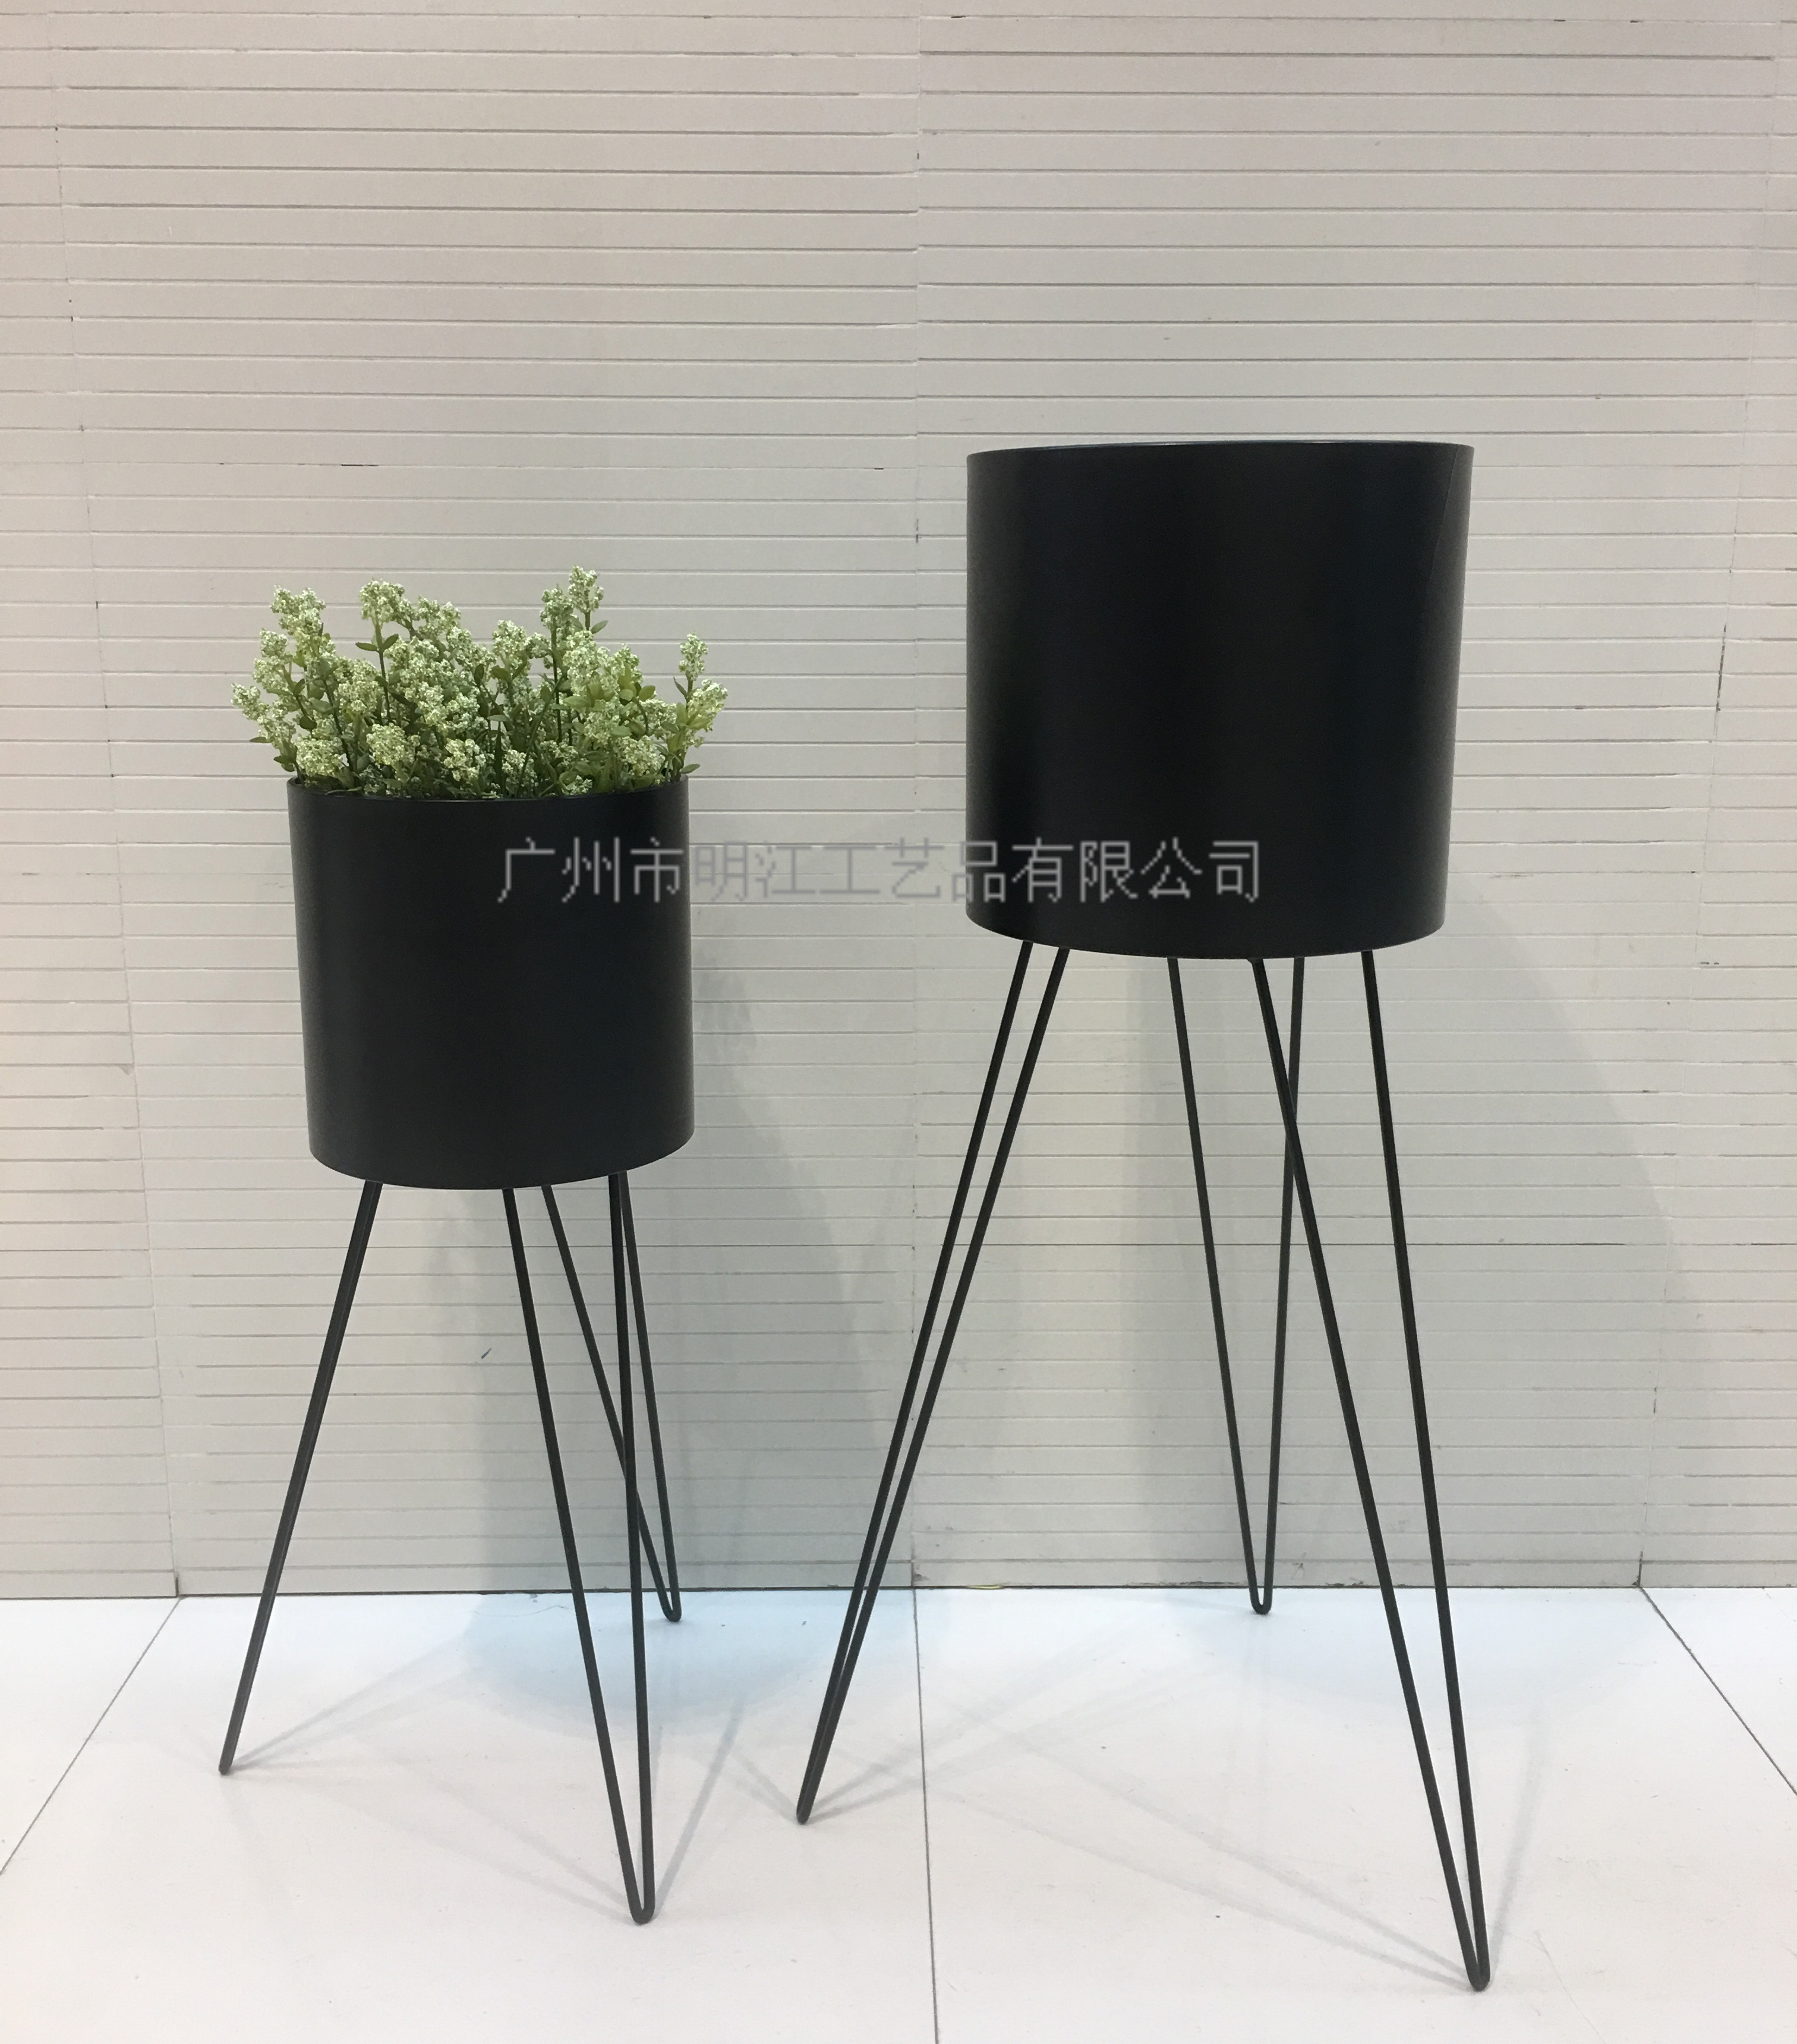 Cari Terbaik Model Rak Bunga Dari Besi Produsen Dan Model